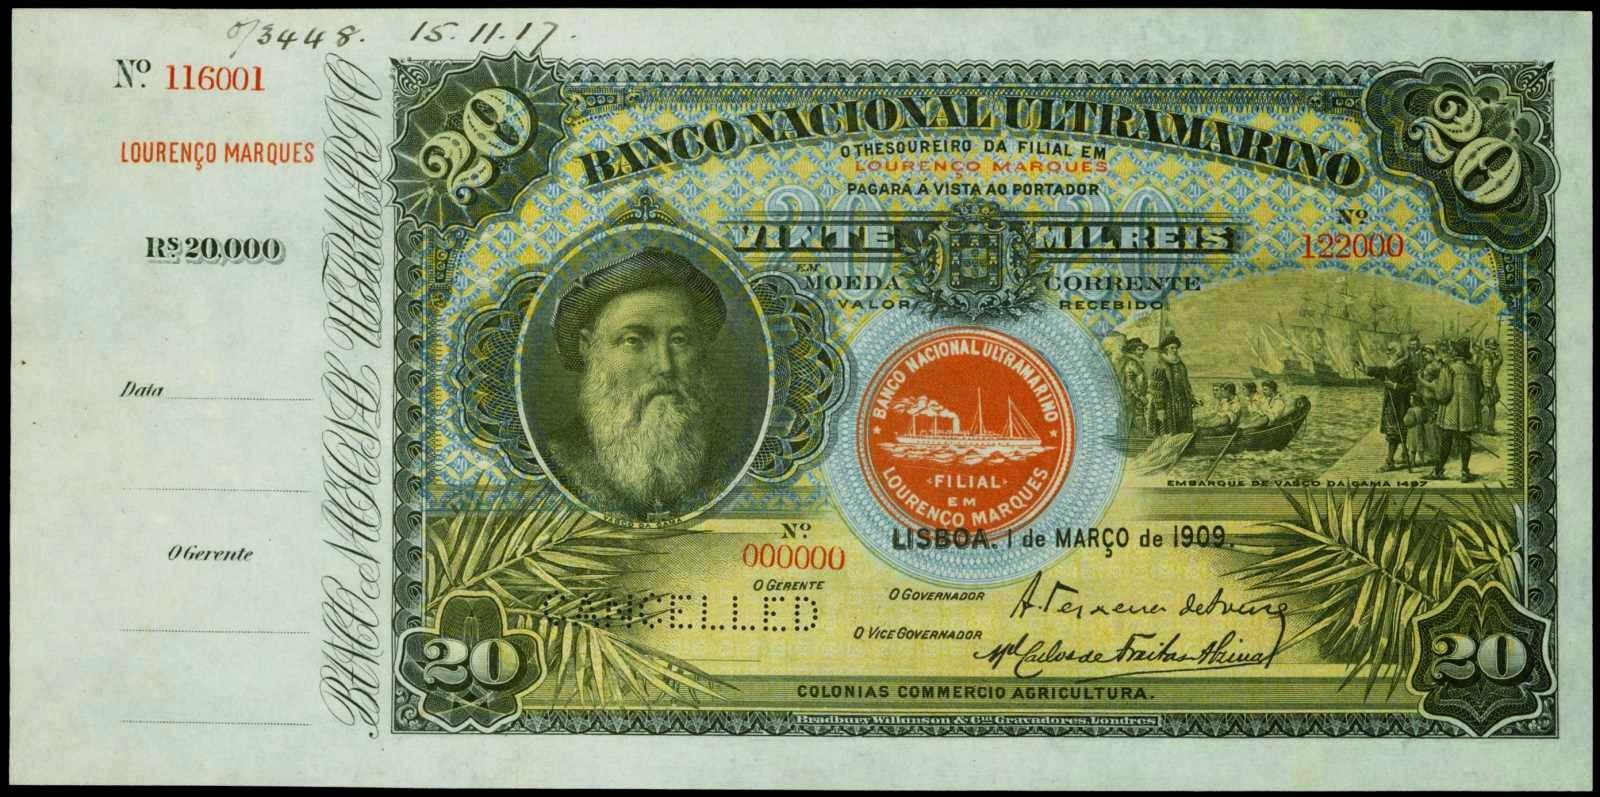 banknotes 20 Mil Reis Banco Nacional Ultramarino Mozambique